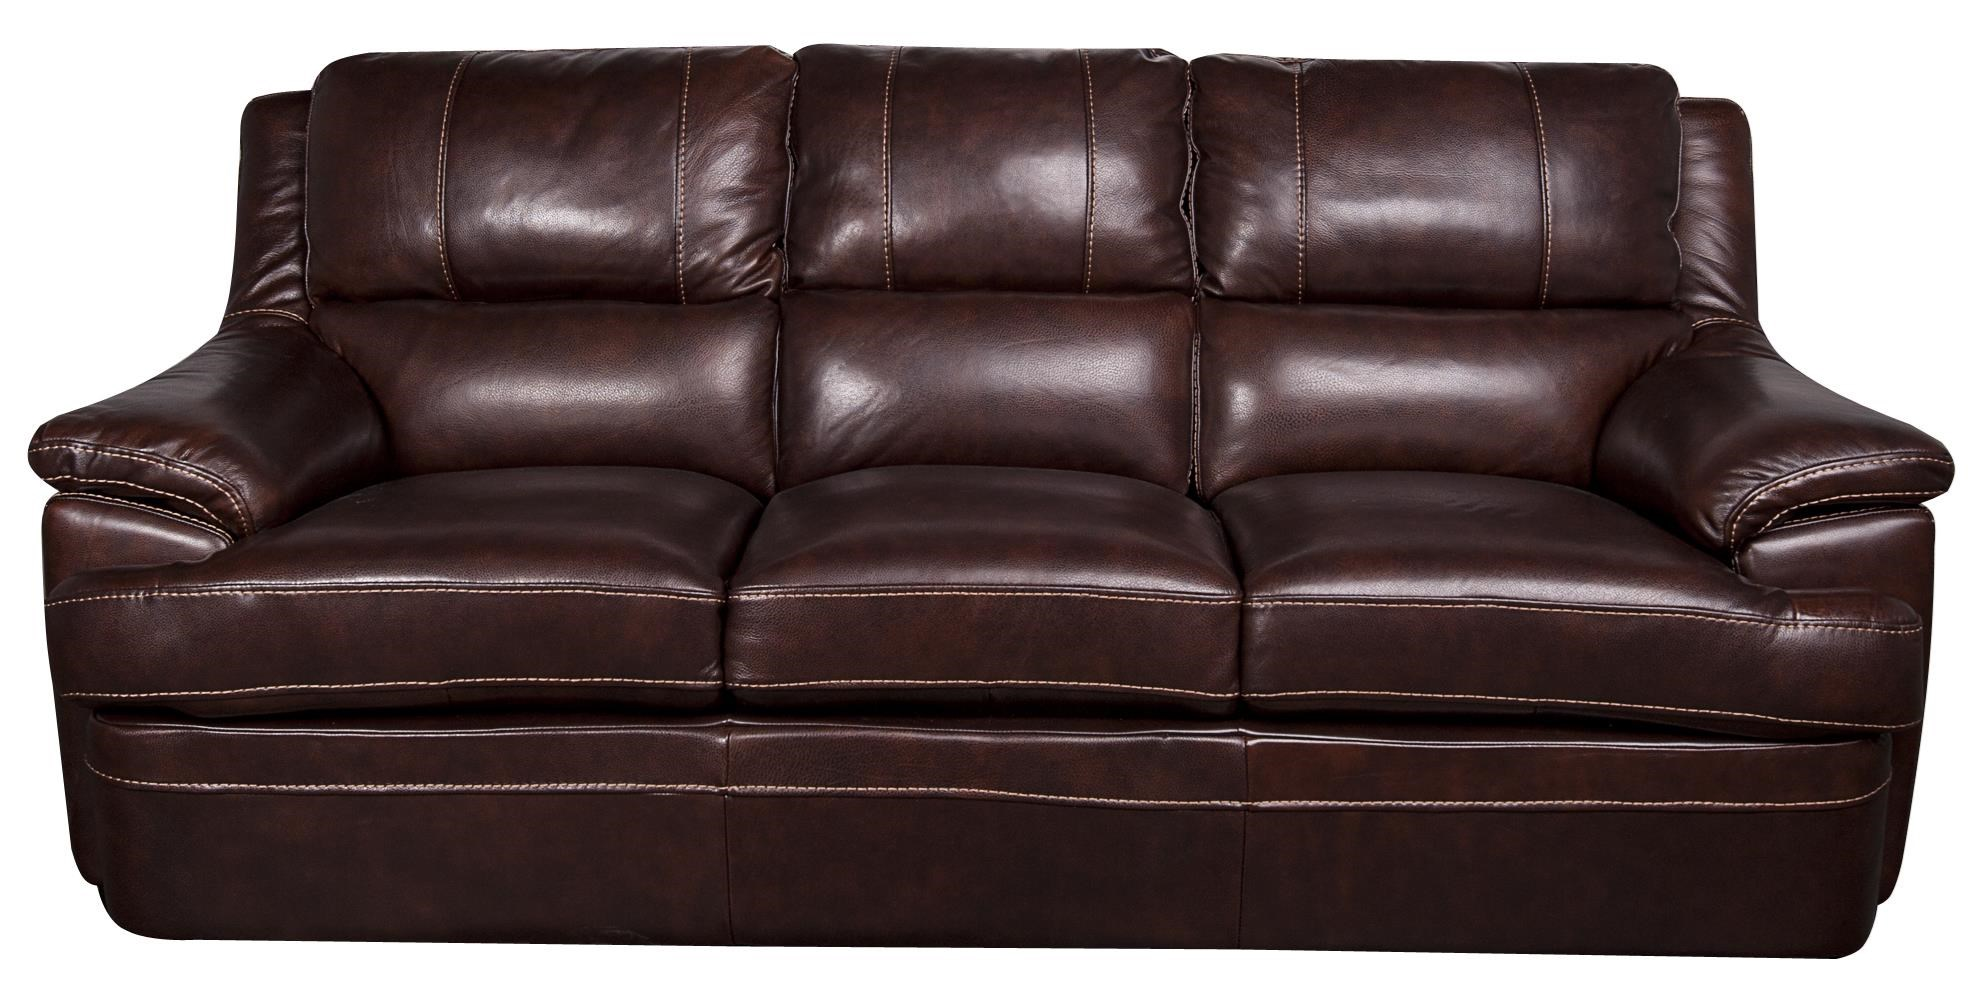 Morris Home Furnishings Zane - Zane Leather-Match* Sofa - Item Number: 225050618